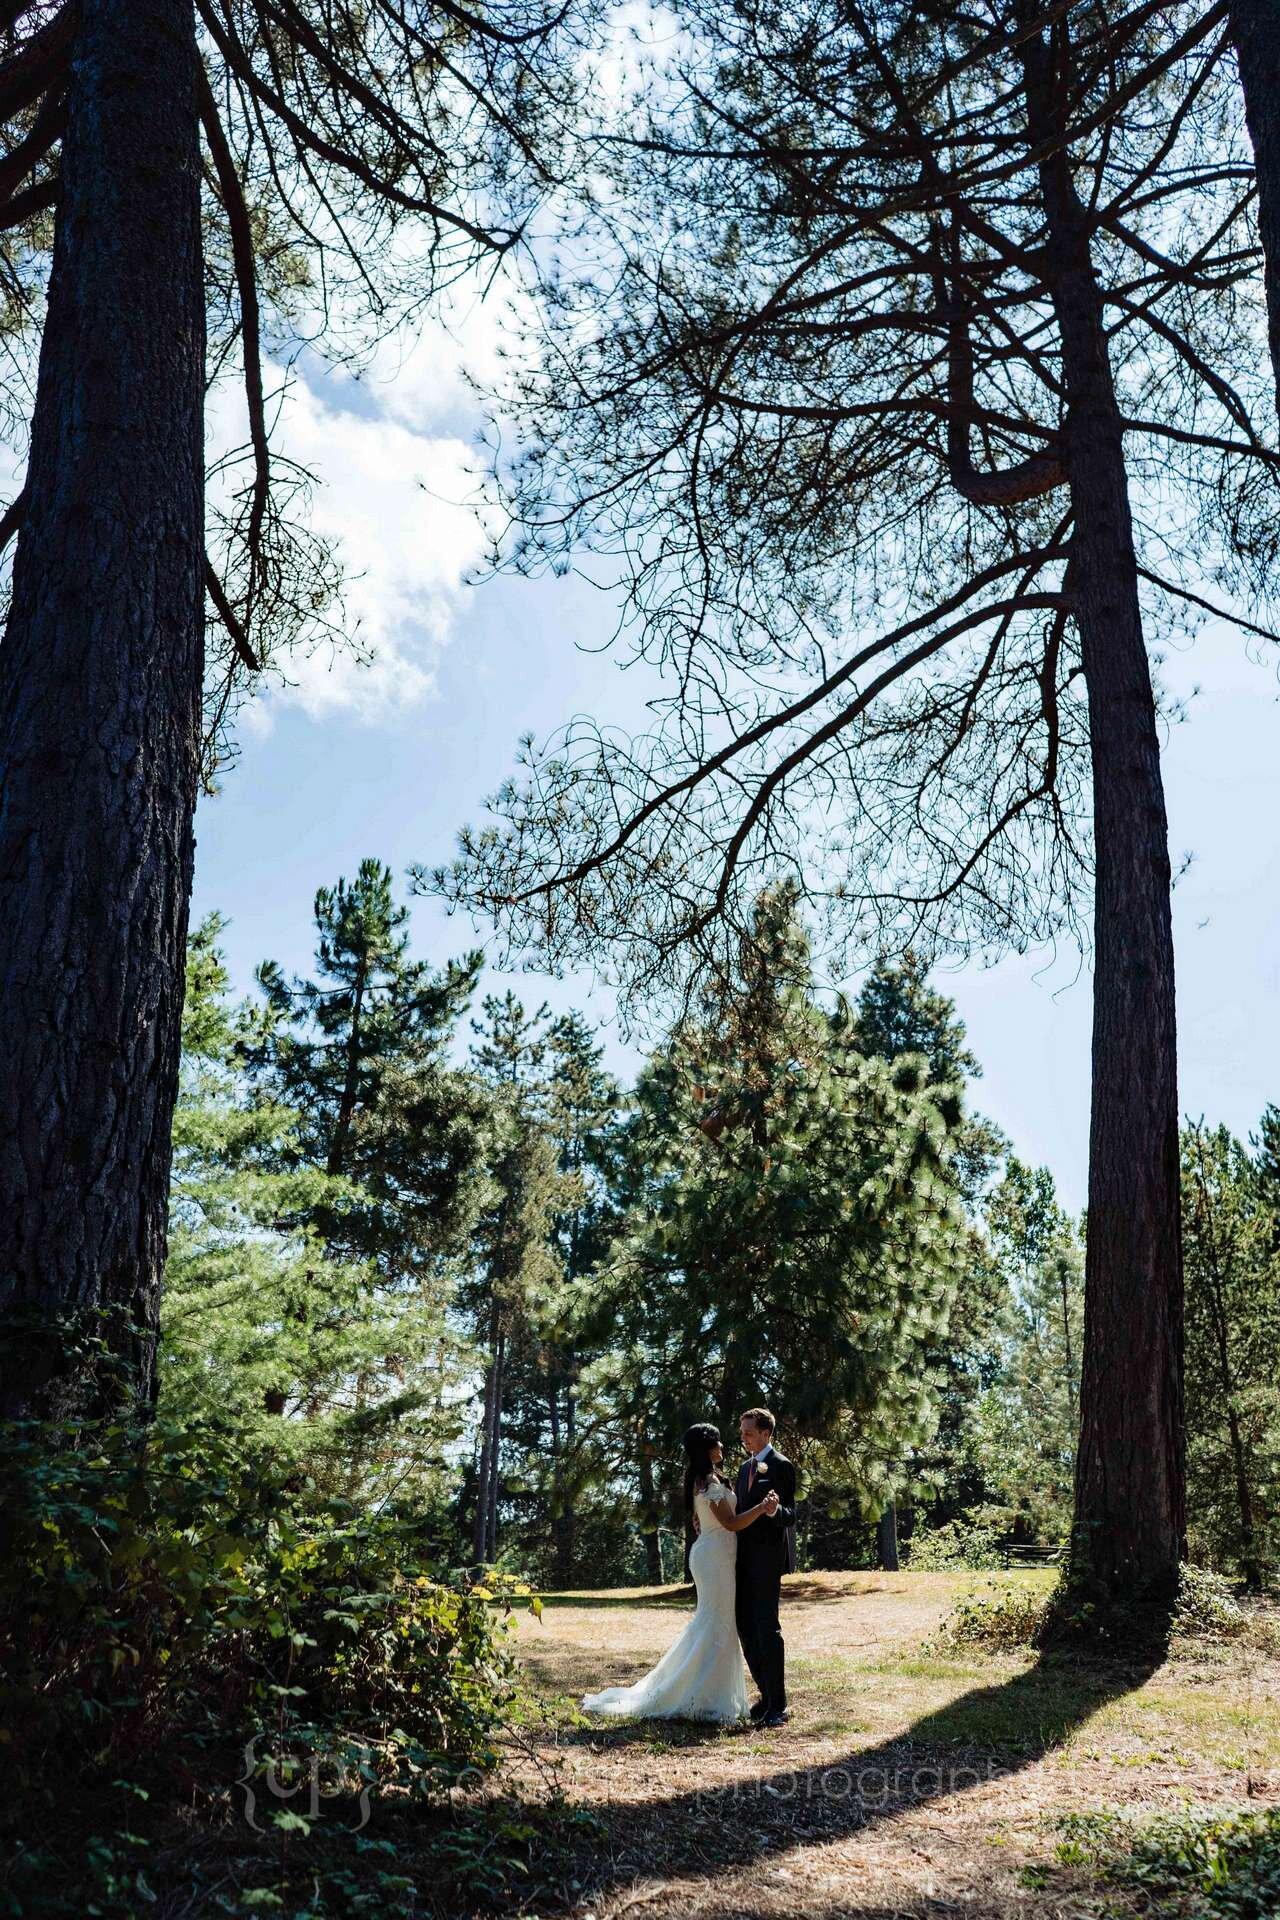 067-washington-park-arboretum-wedding.jpg